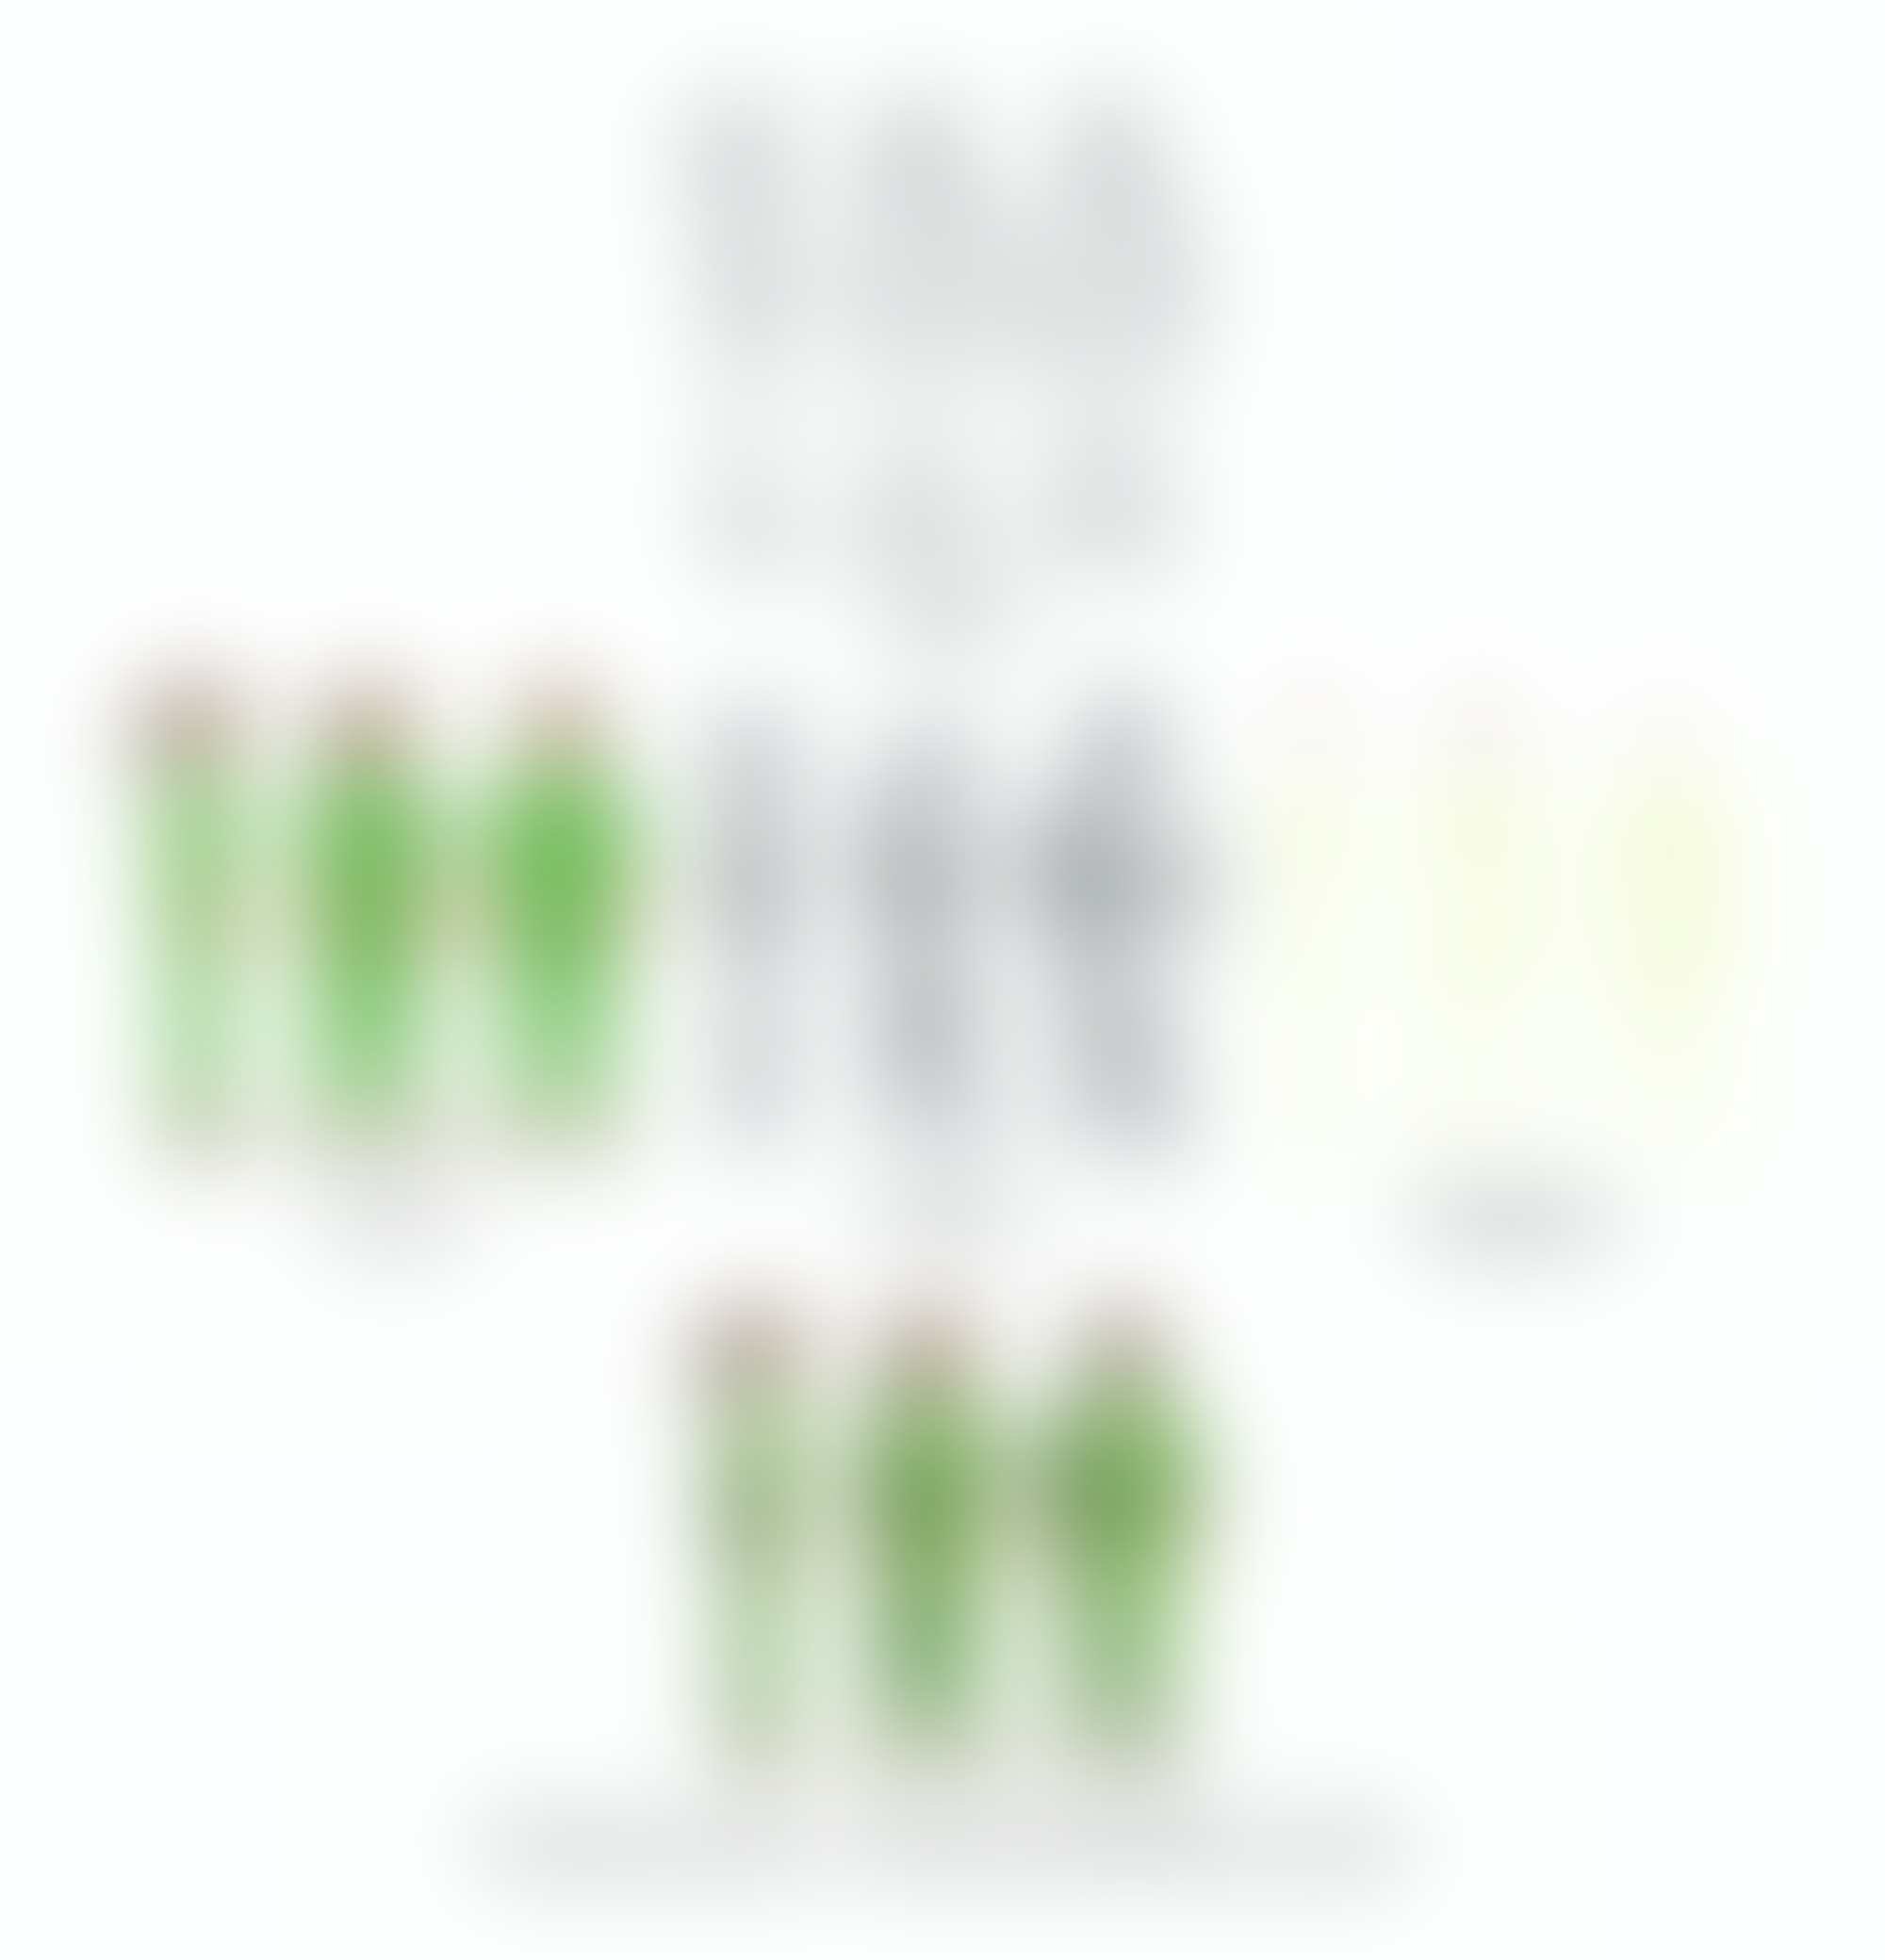 6 Character breakdown autocompressfitresizeixlibphp 1 1 0max h2000max w3 D2000q80sf0d7a01205b7f64c78dd7c9cfebd7116